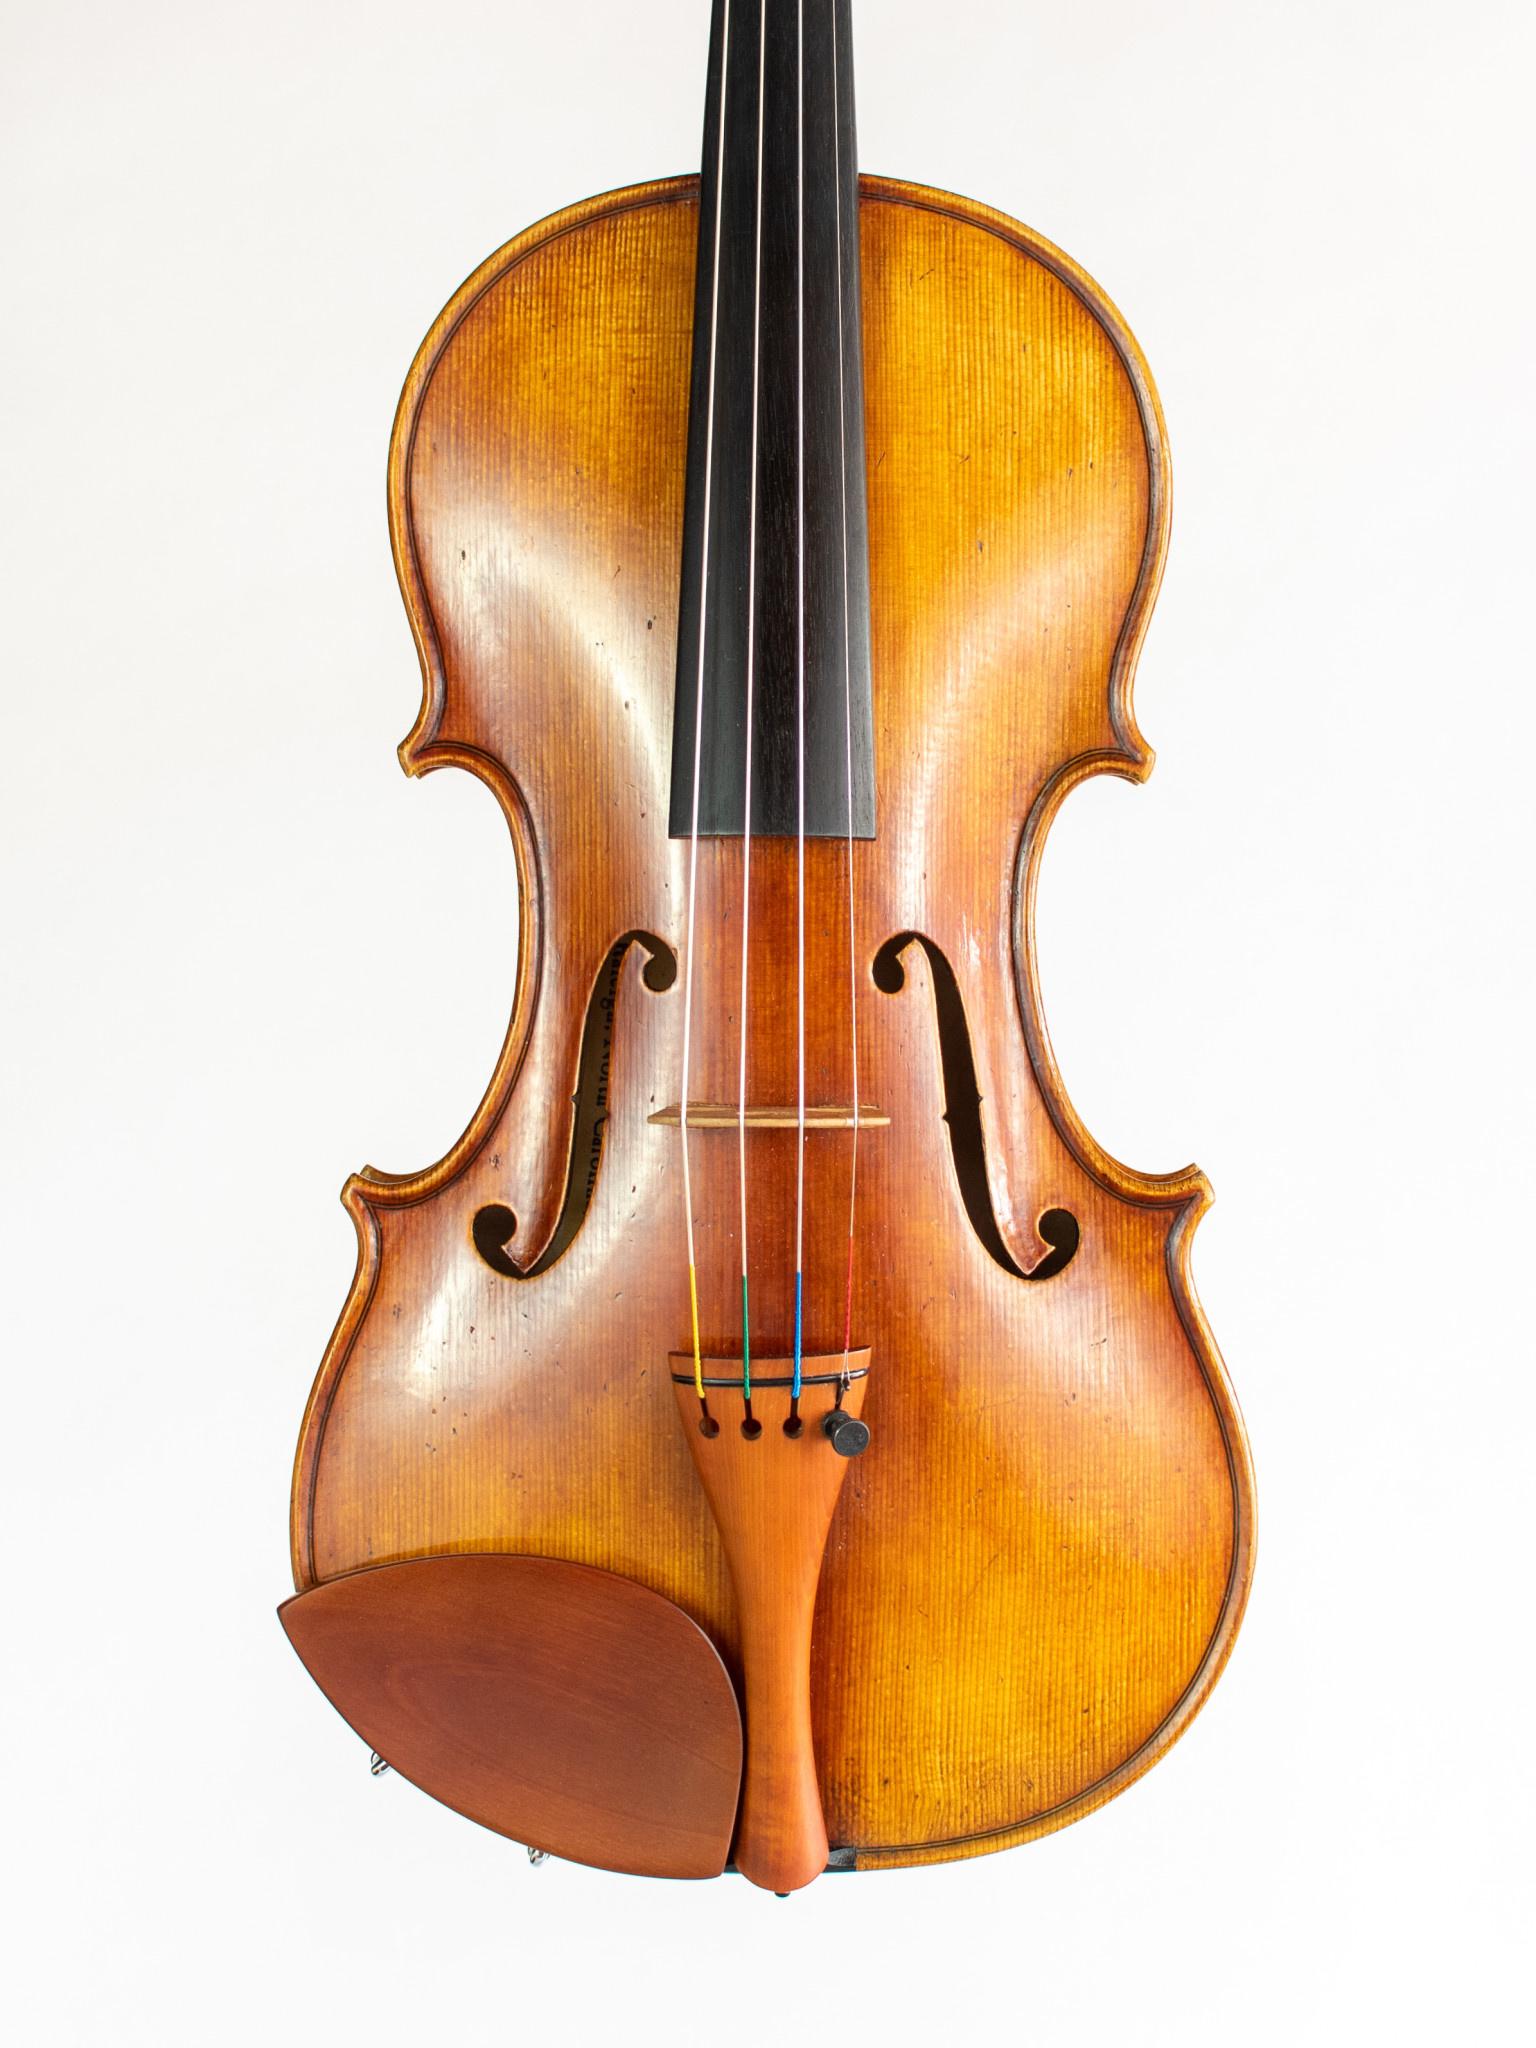 John Montgomery violin, 2014, Raleigh, North Carolina, USA